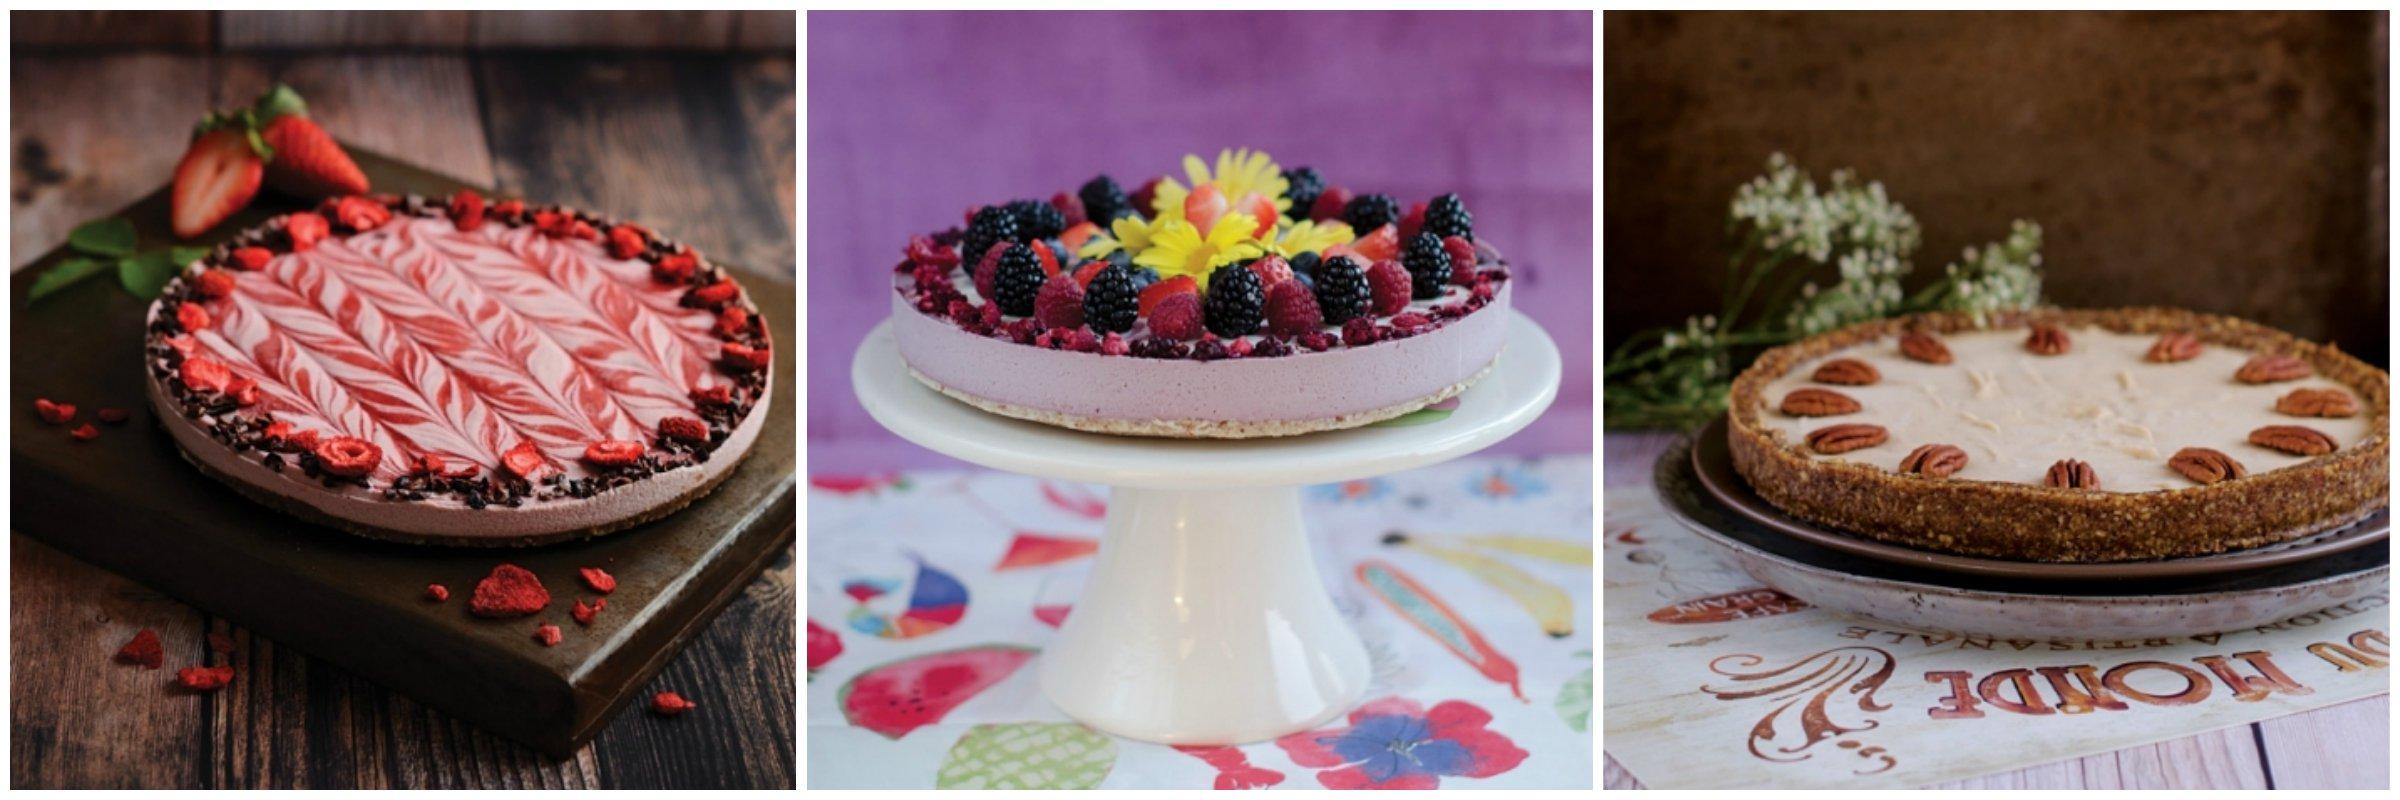 Raw koláče Frangipani + FoodCult